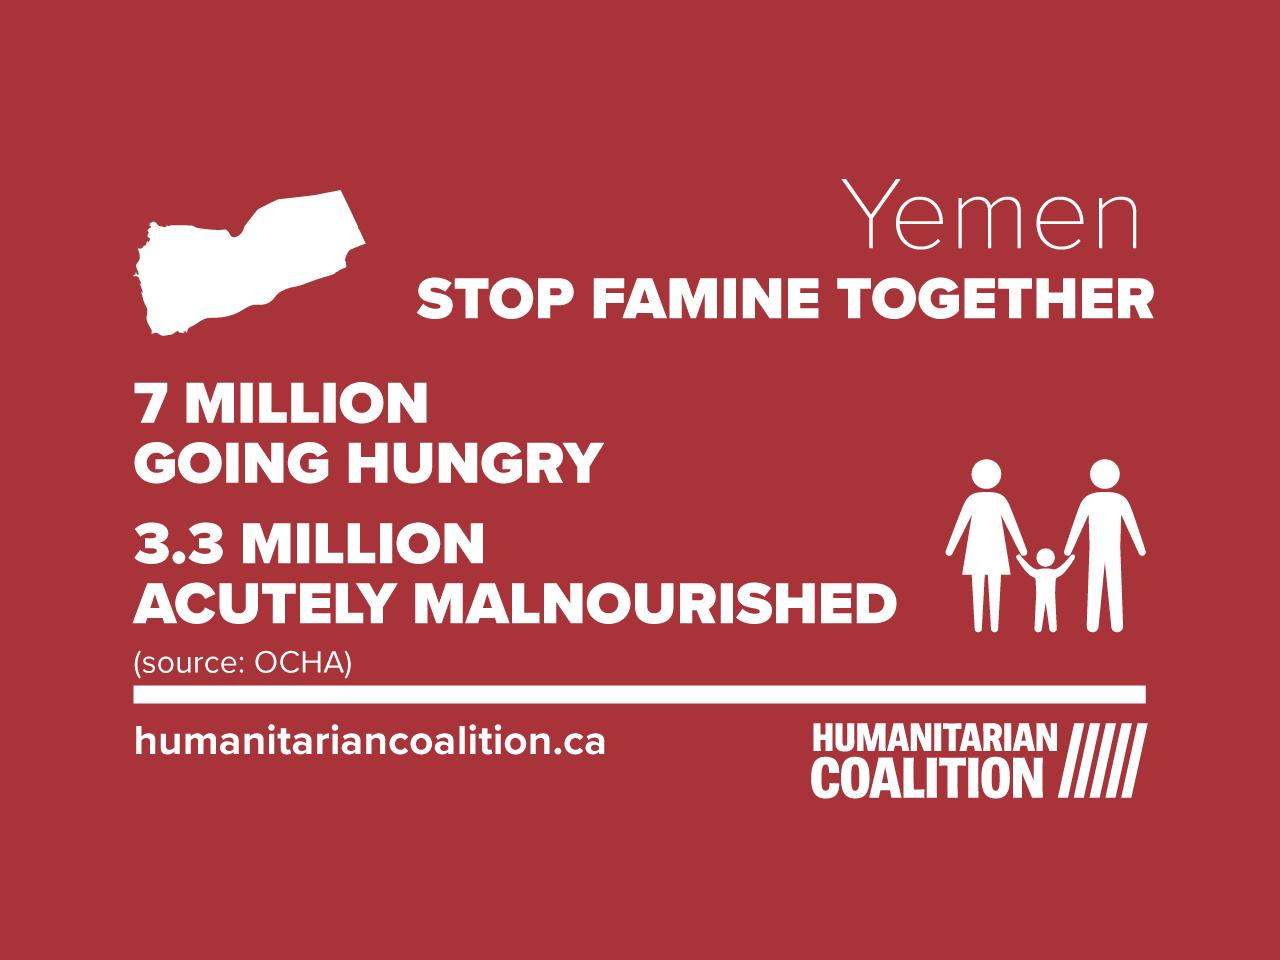 food crisis in Yemen infographic